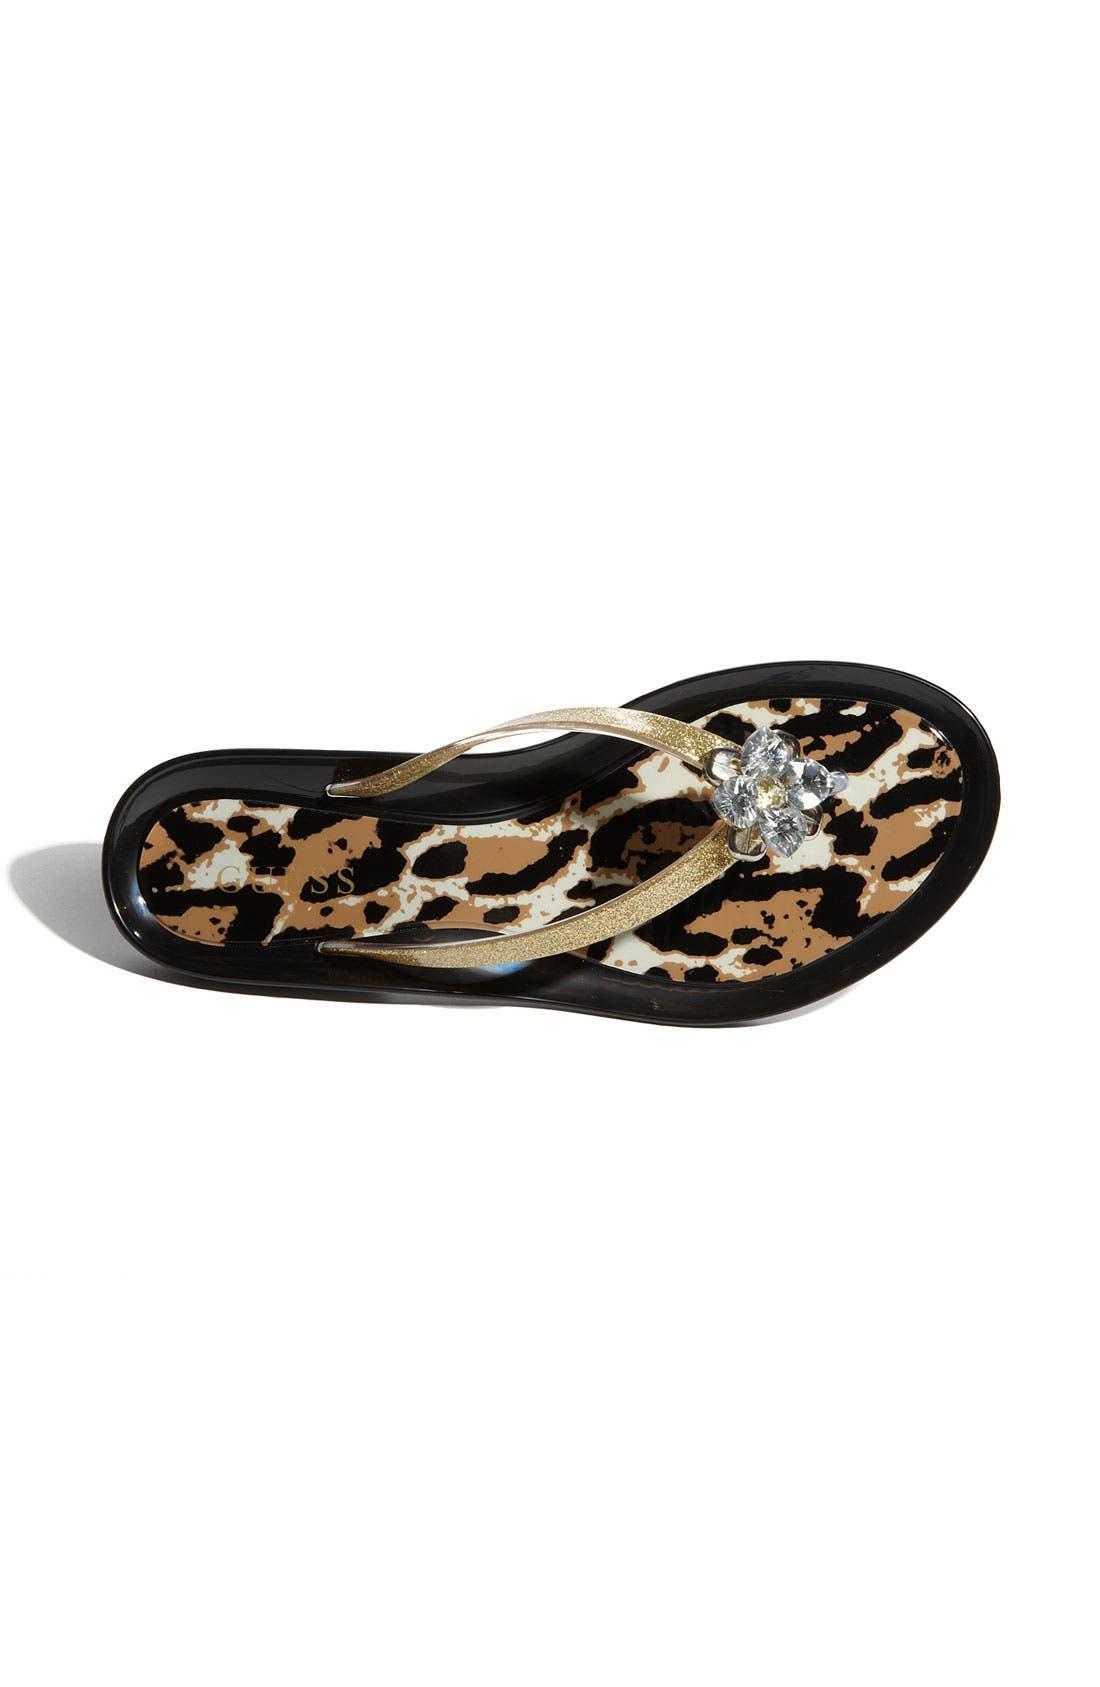 Alternate Image 3  - GUESS 'Neno' Sandal